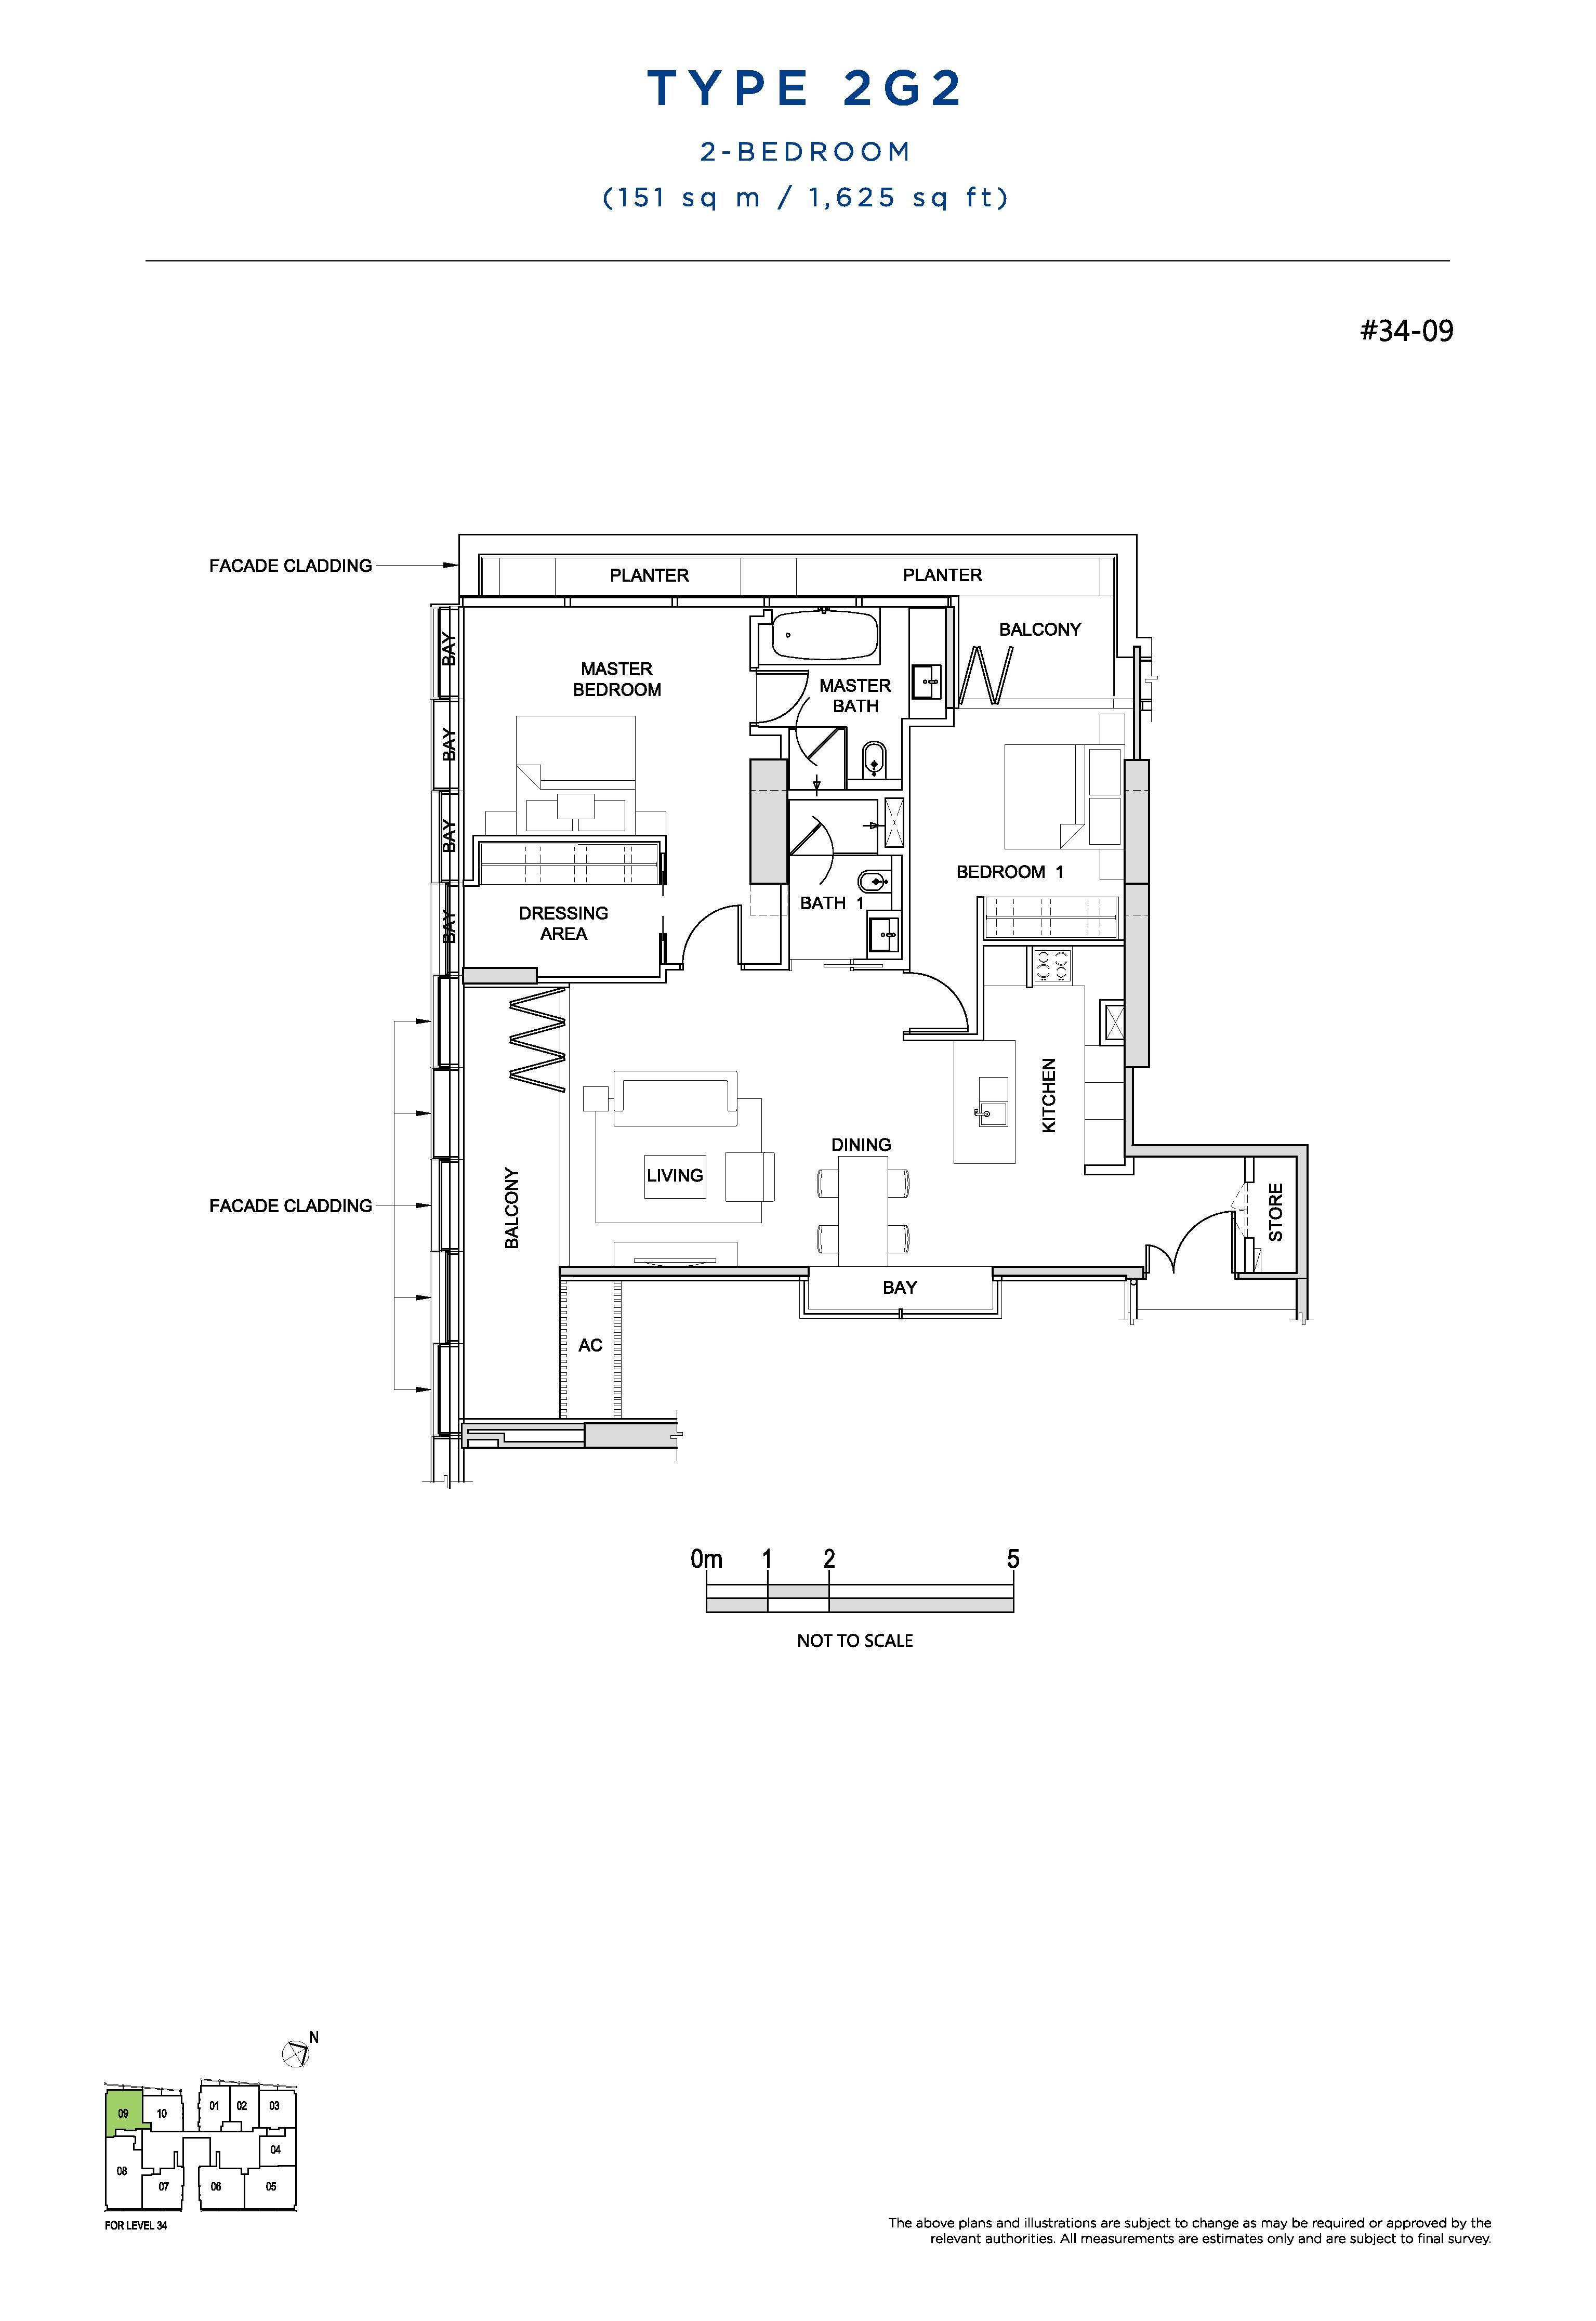 South Beach Residences 2 Bedroom Floor Plans Type 2G2